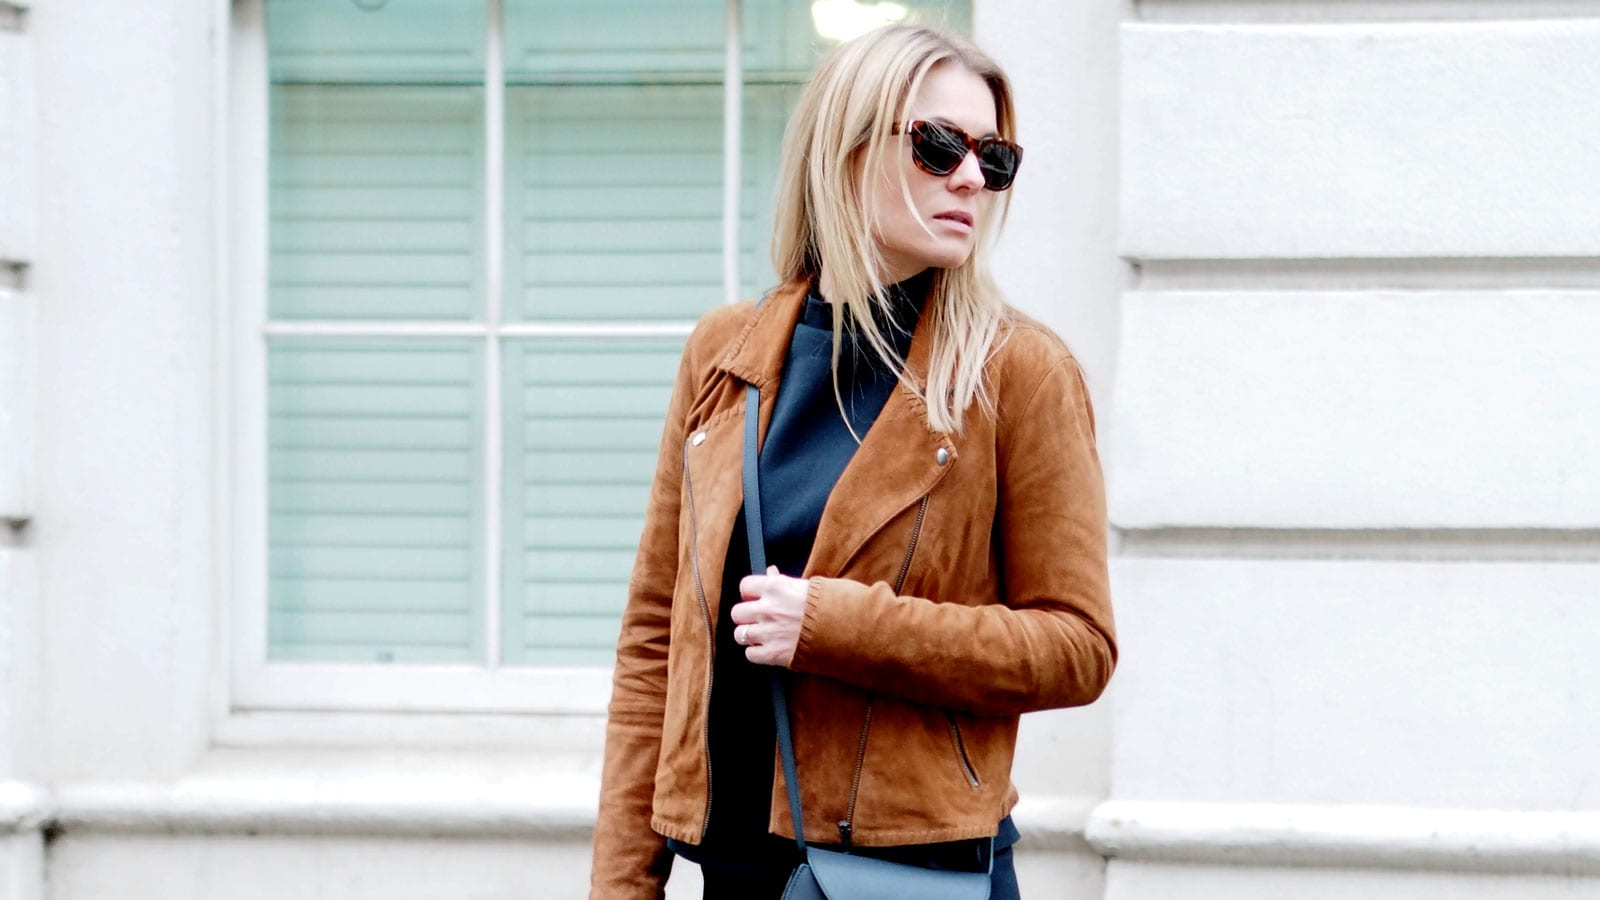 Style&Minimalism | It's Personal | Samsøe & Samsøe Top & Skirt Navy Co-ord, Second Female Tan Suede Jacket, Triwa Sunglasses